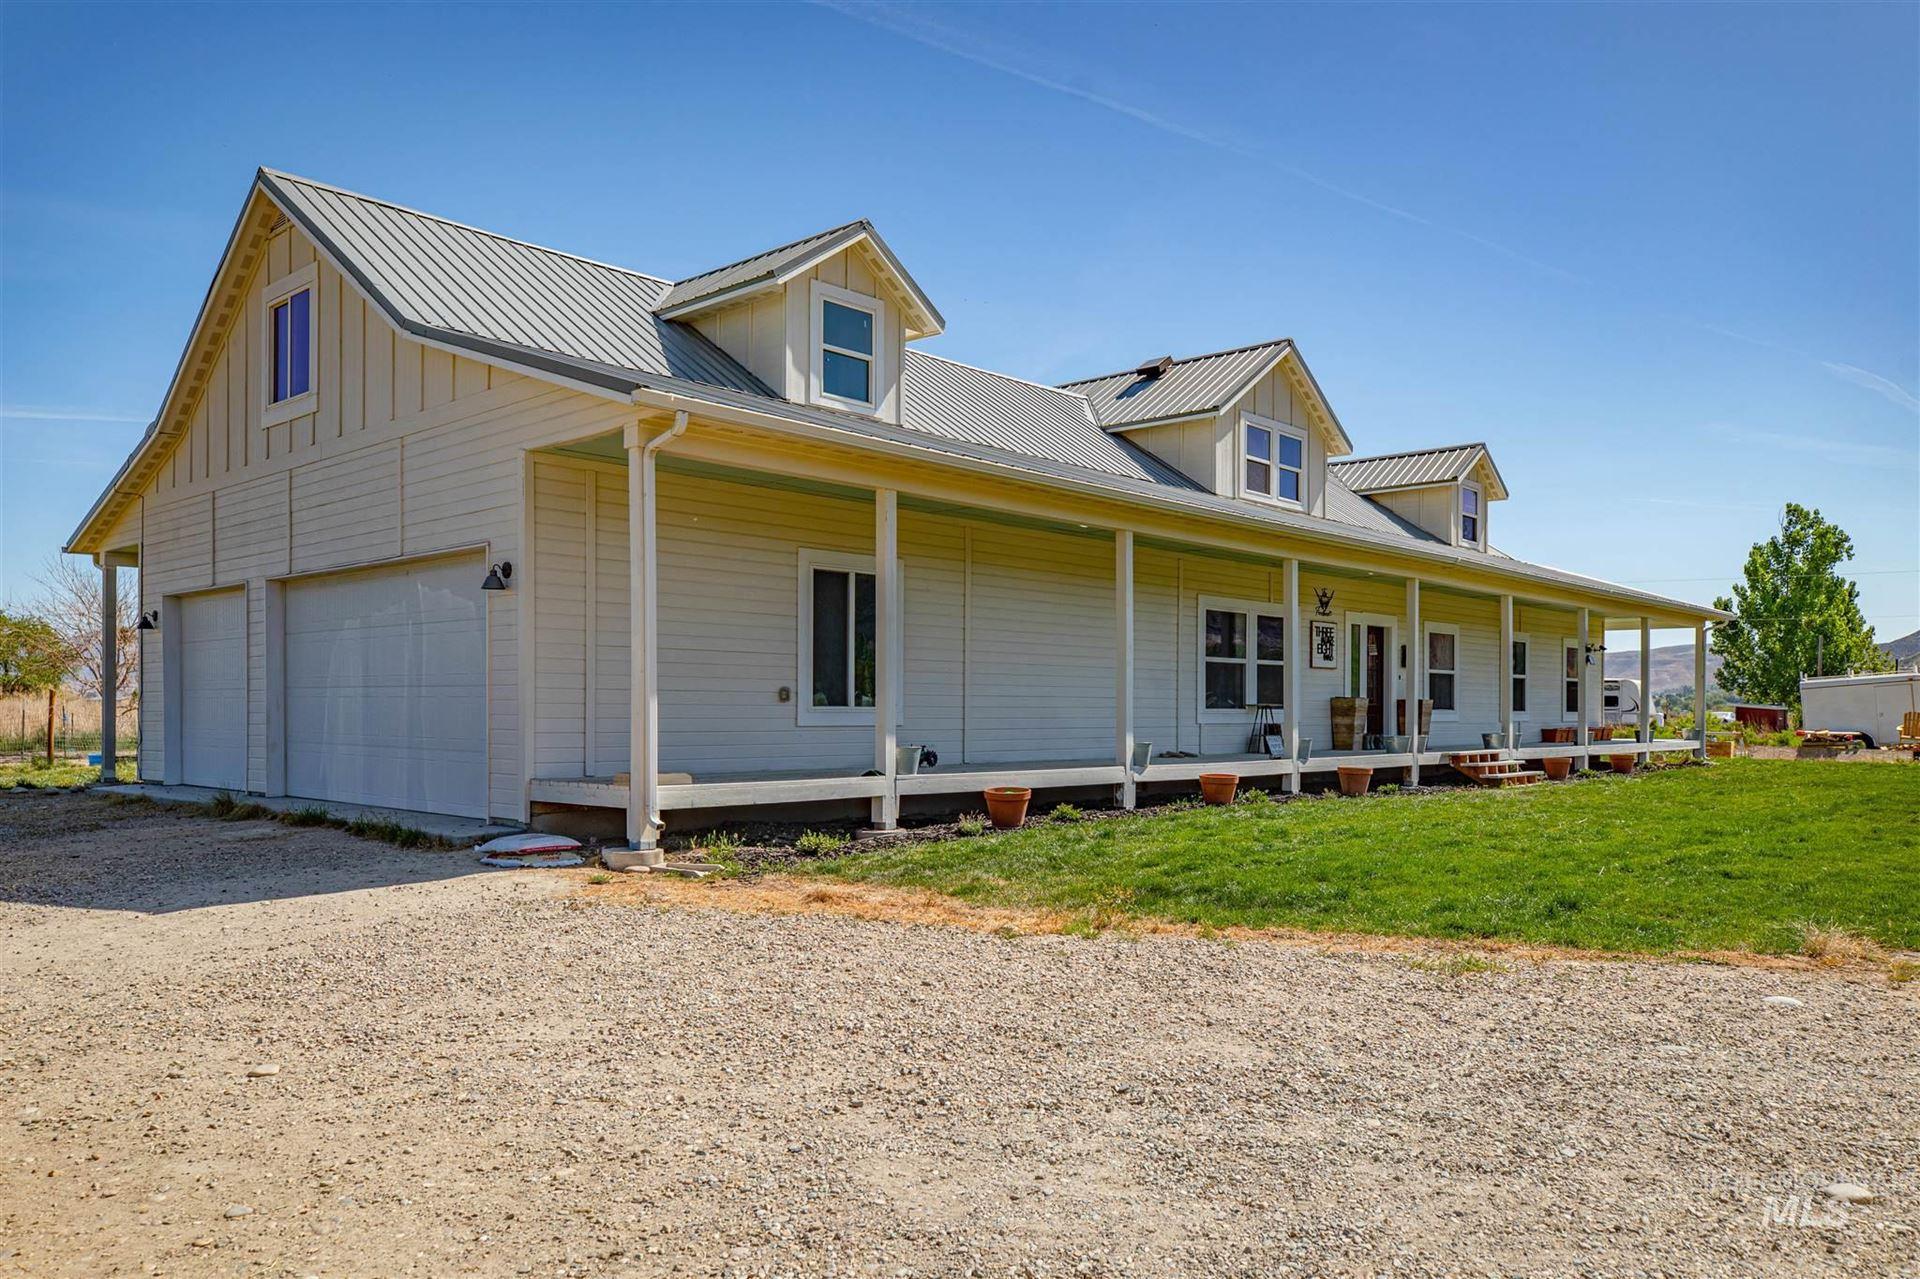 Photo of 3981 Ranch Lane, Emmett, ID 83617 (MLS # 98803335)